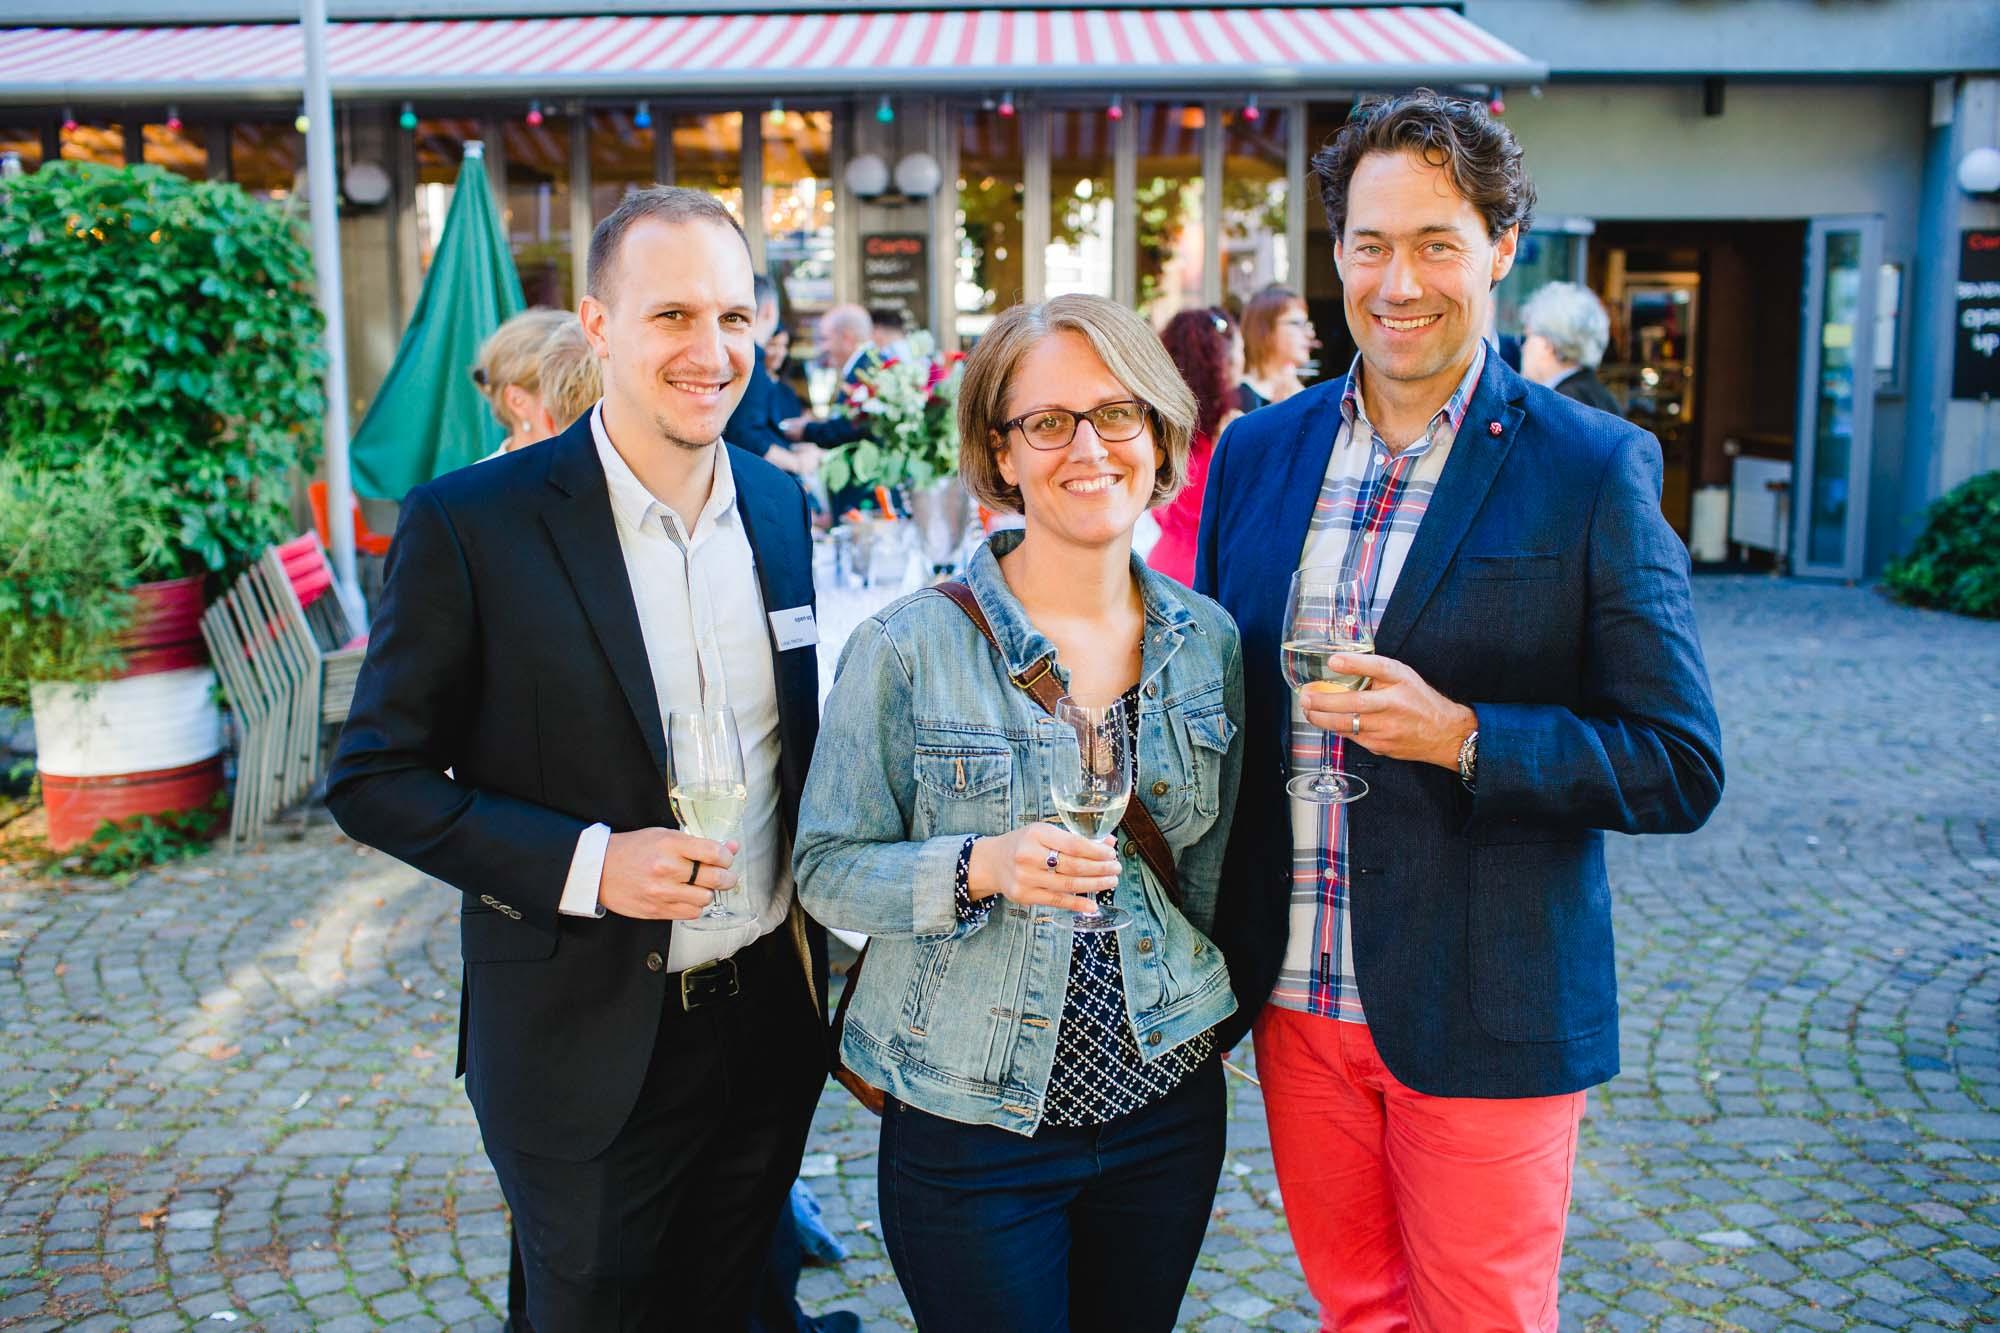 Lukas Mettler, Janine Haas and Gregor Ingold